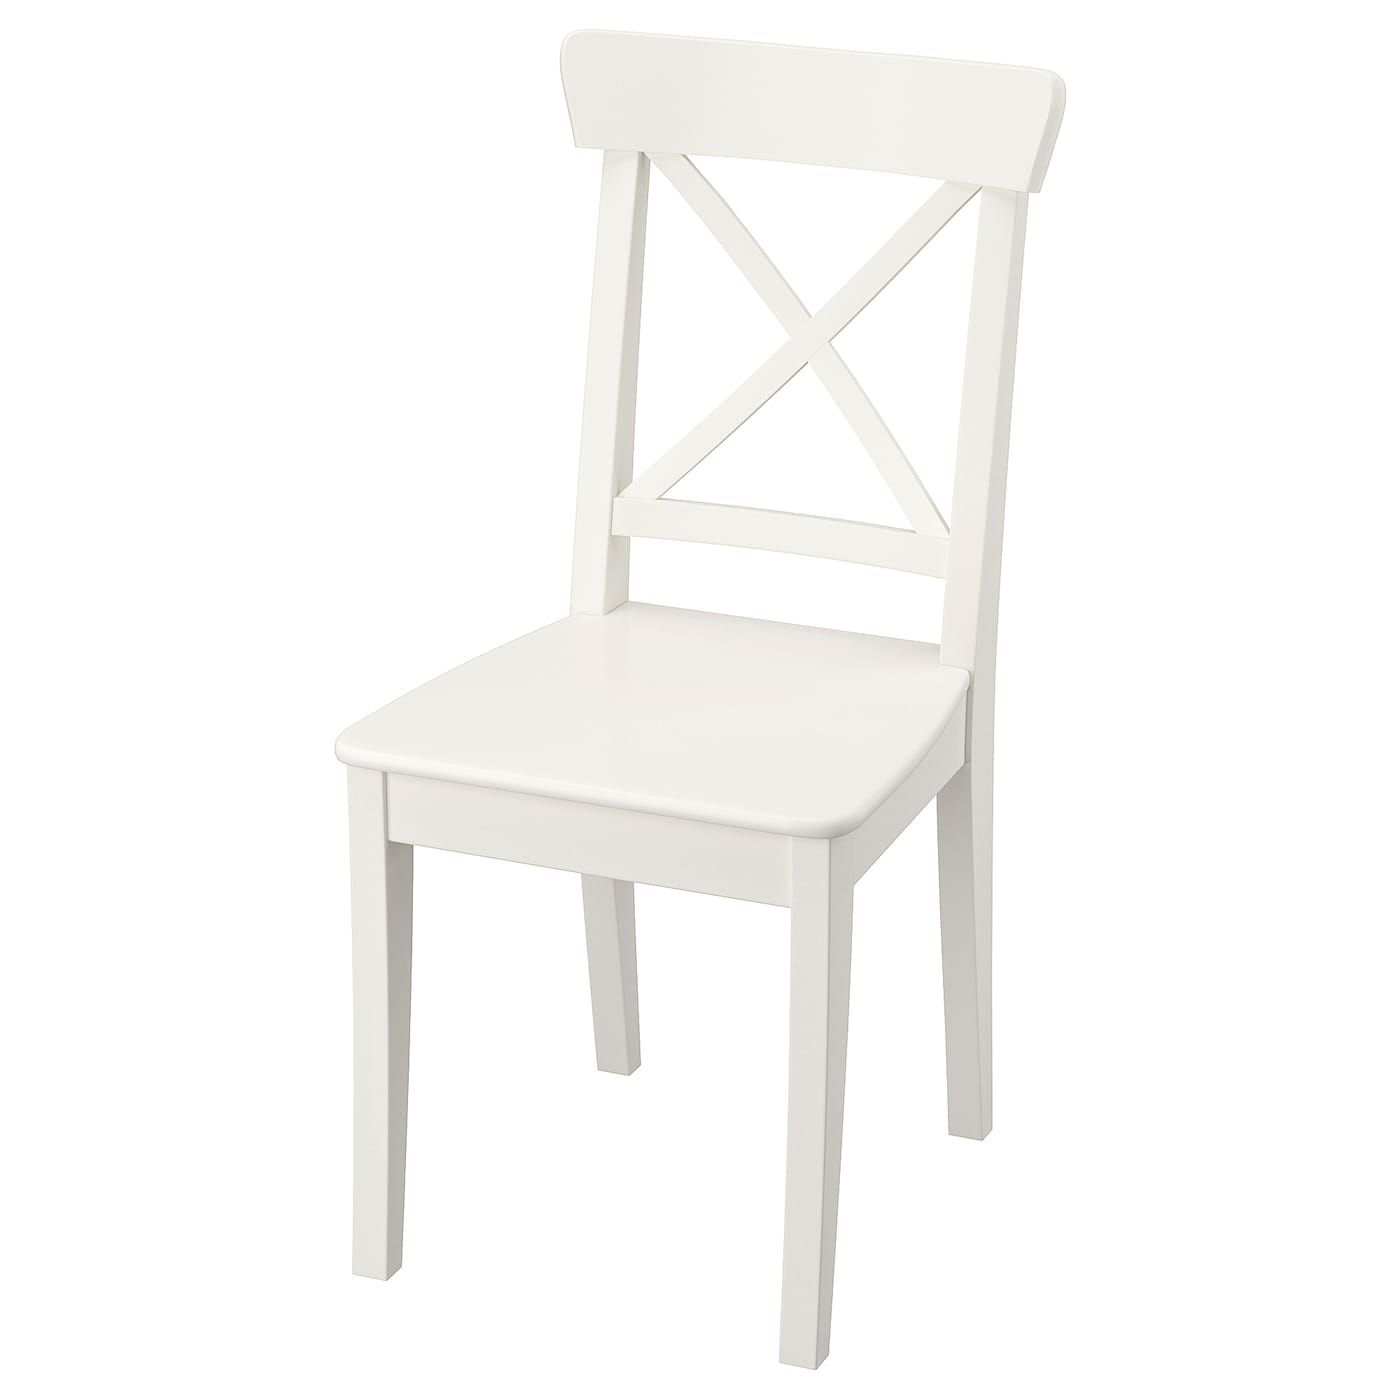 f-chair-white__0728152_PE736113_S5